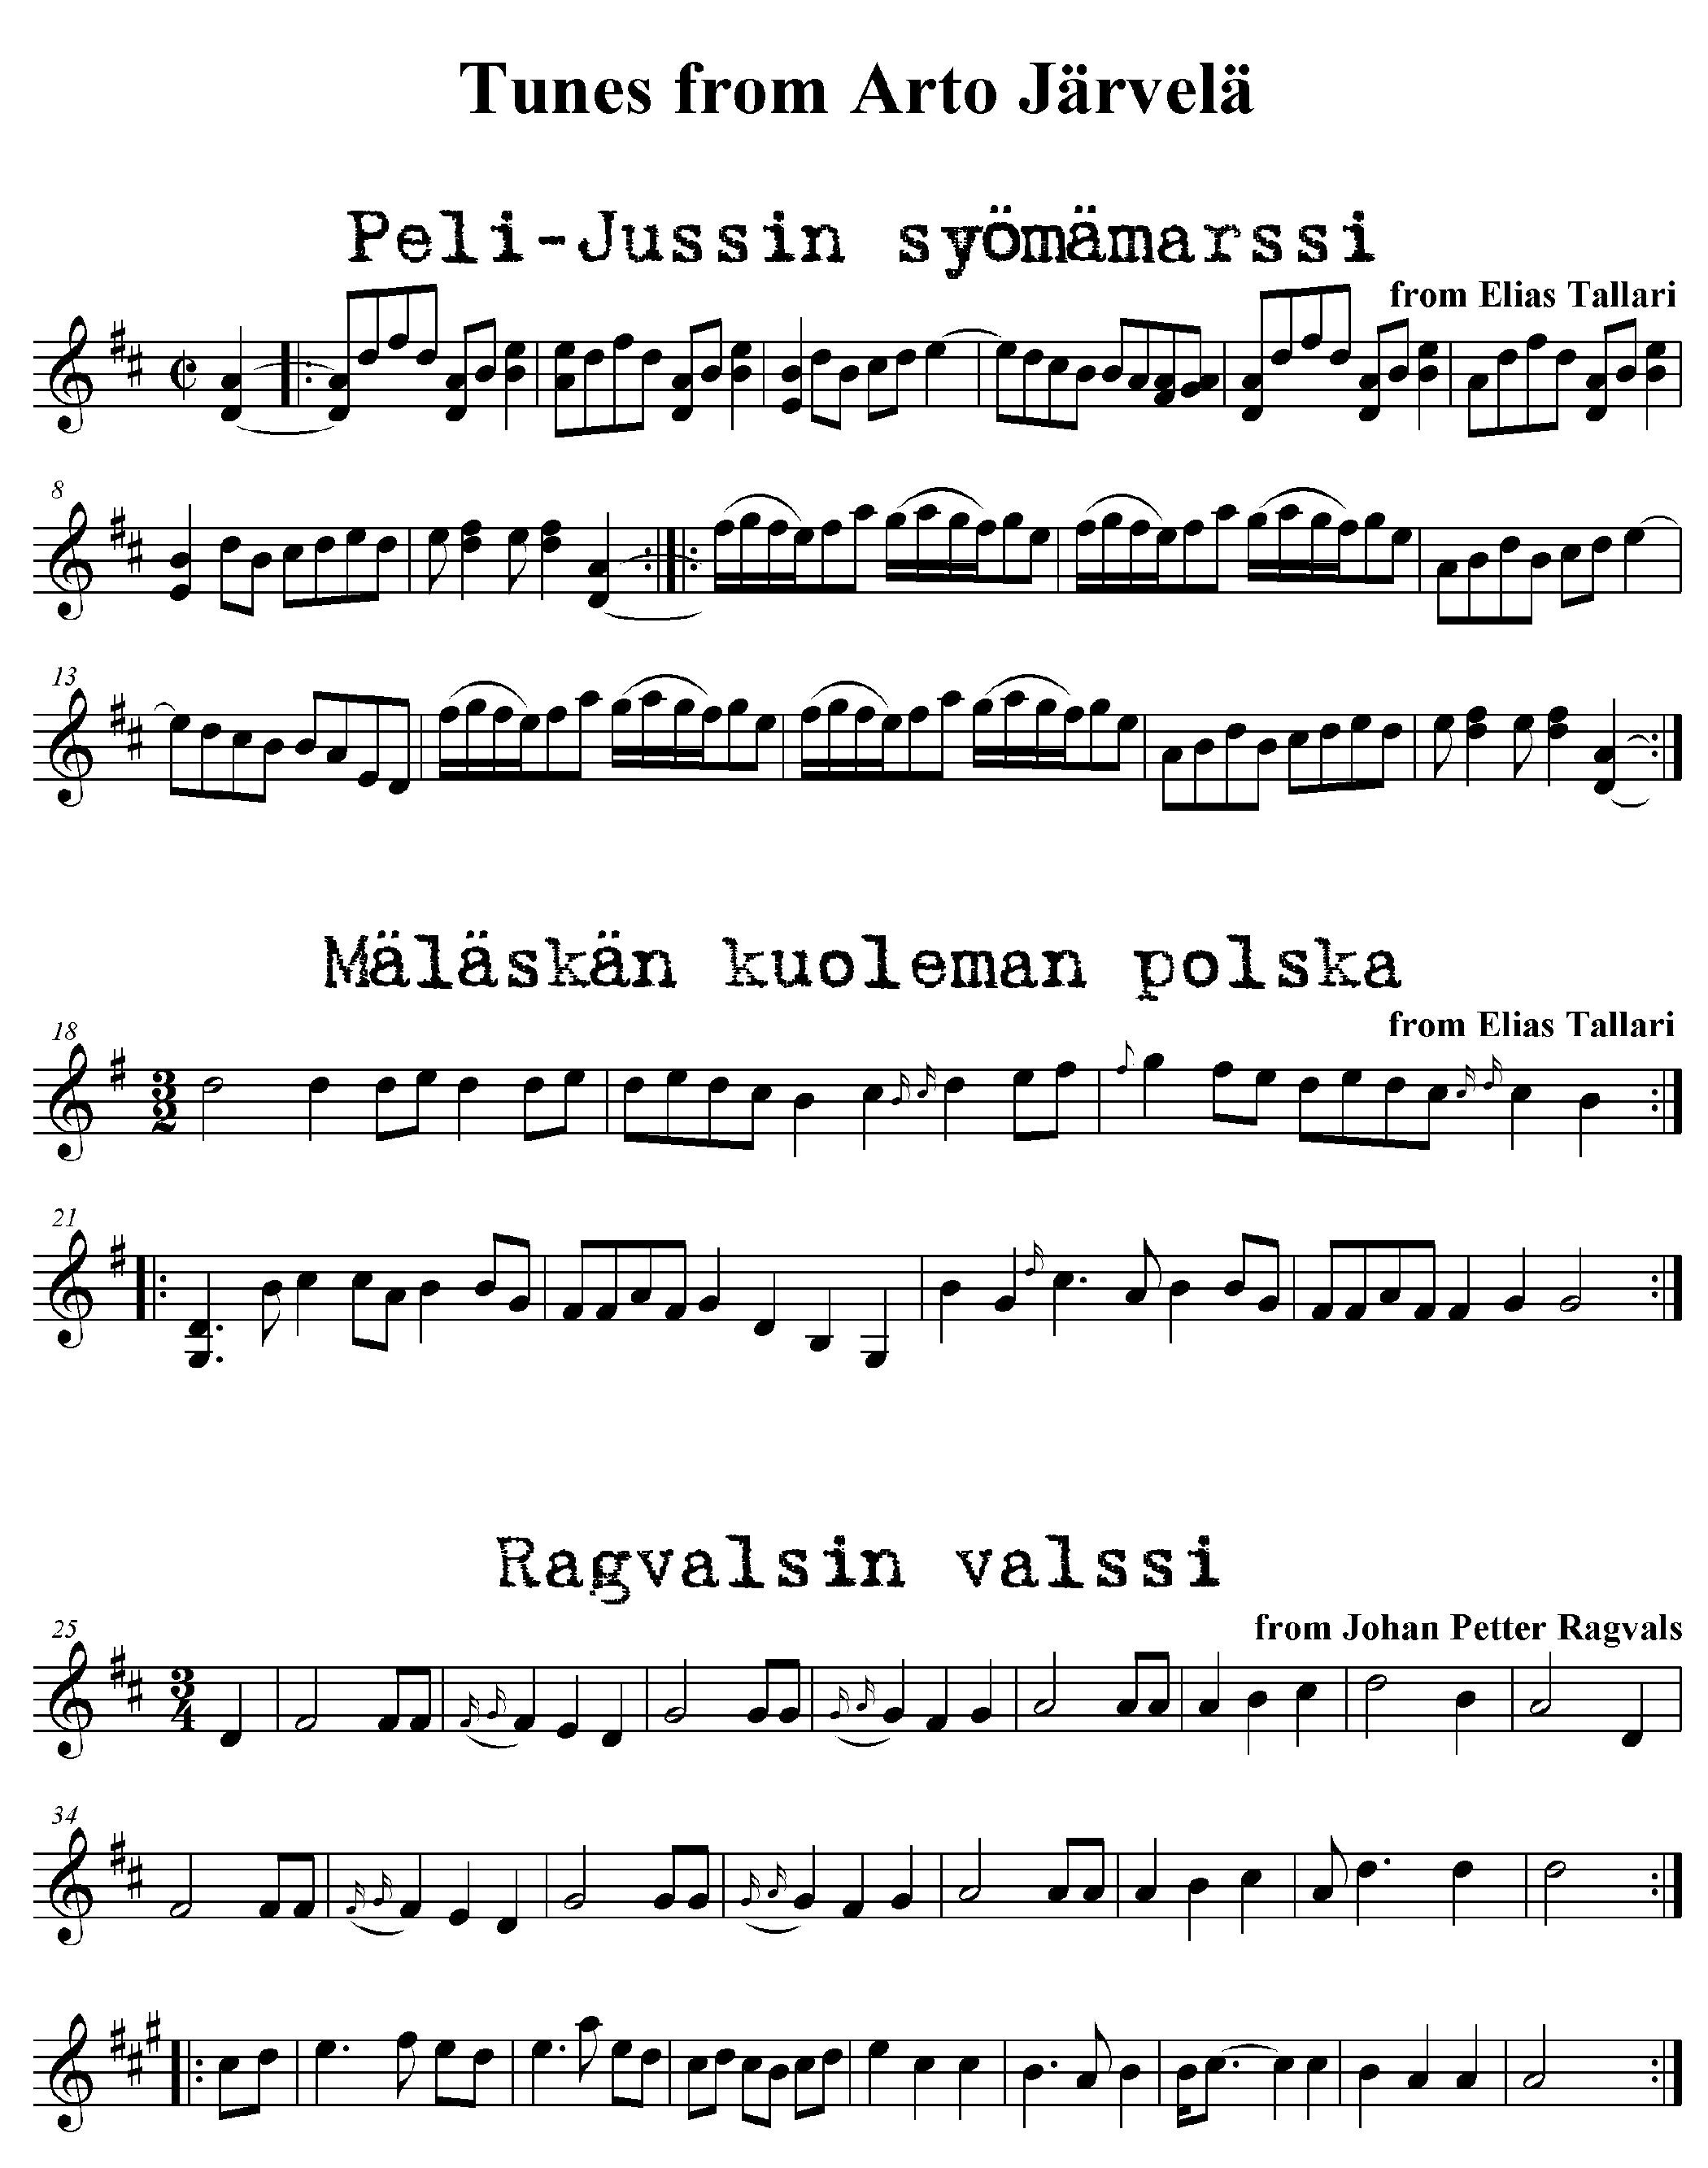 Notation of Arto Jarvela tunes